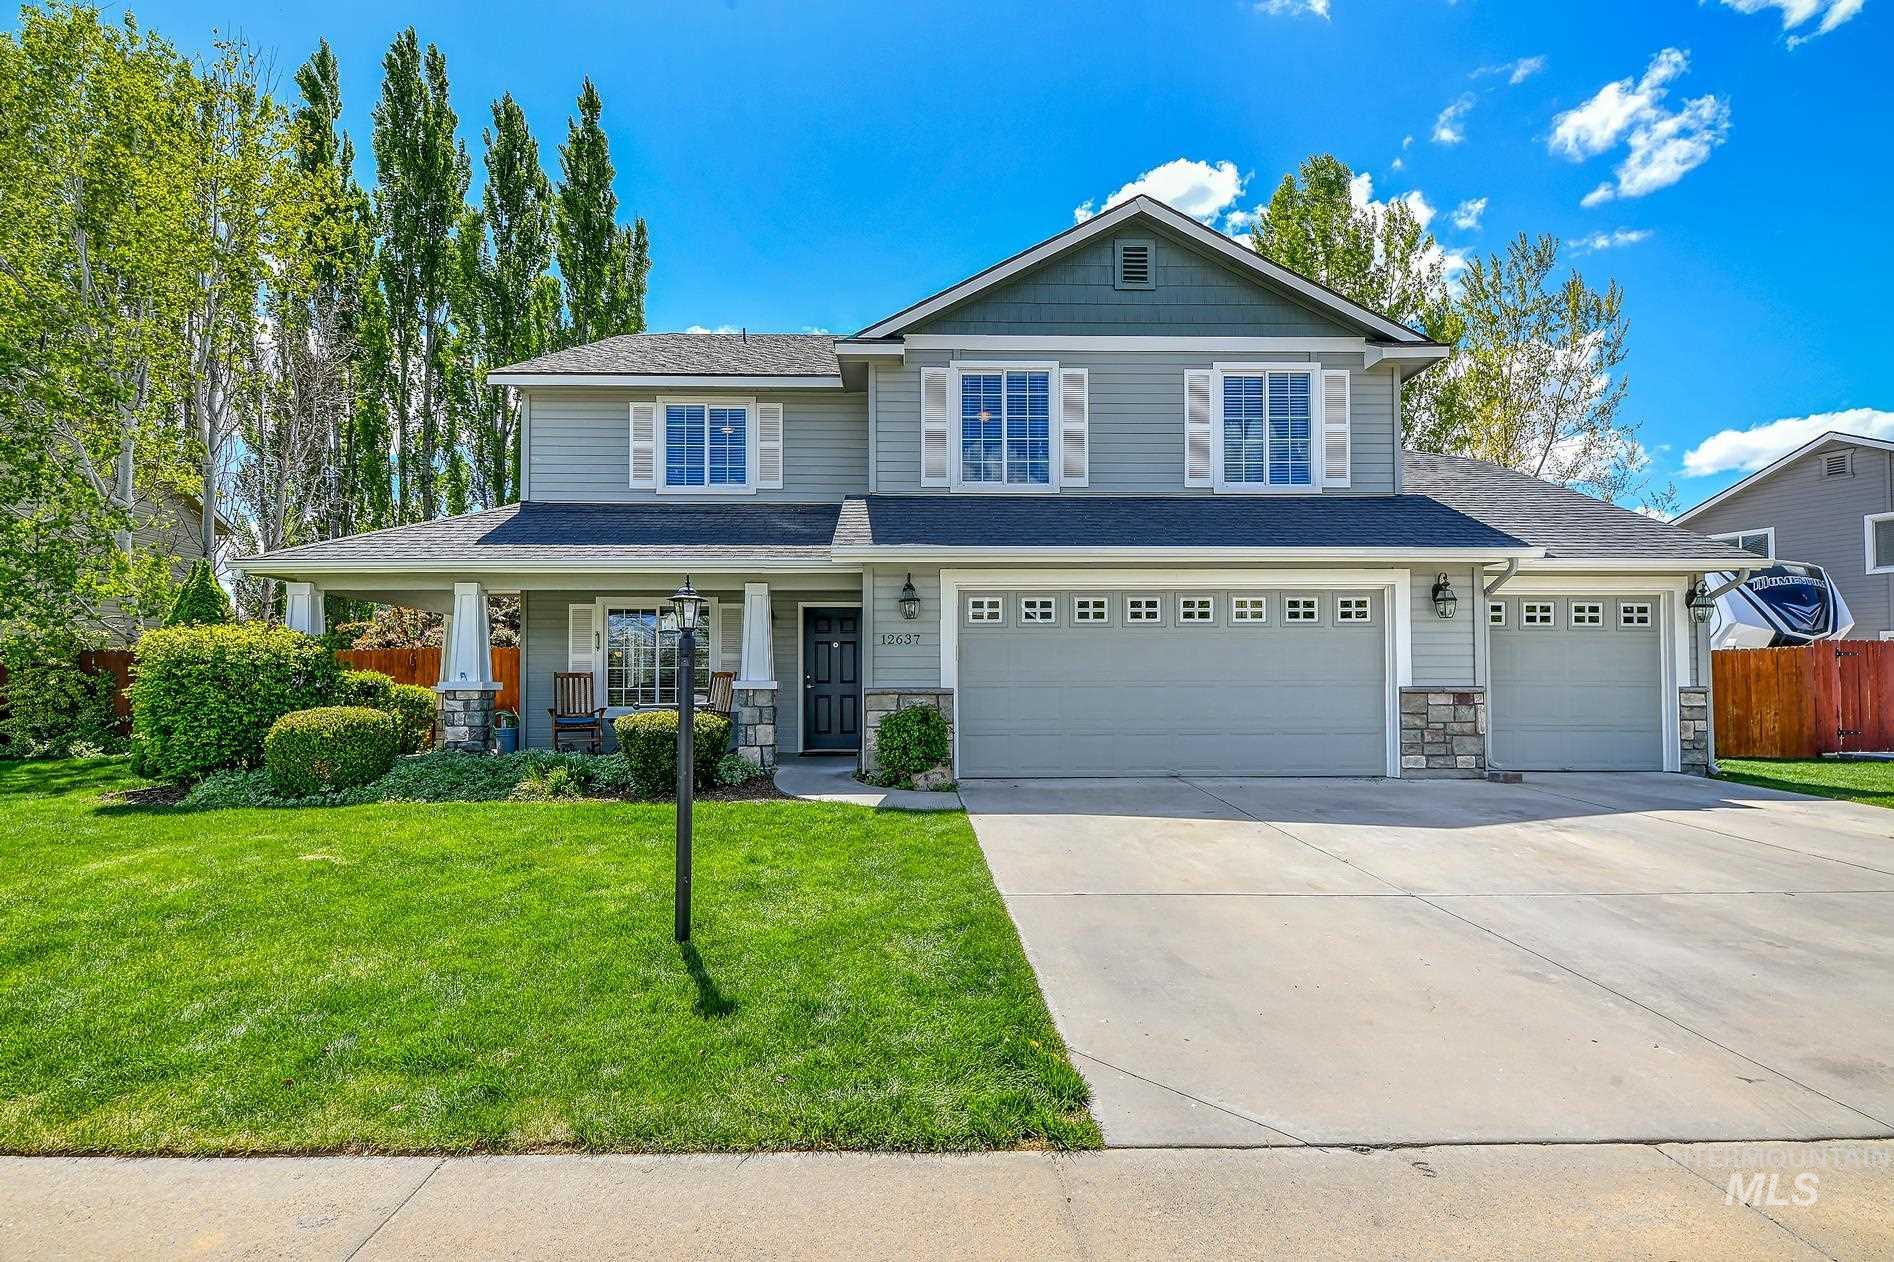 12637 W Heatherhills Property Photo - Boise, ID real estate listing